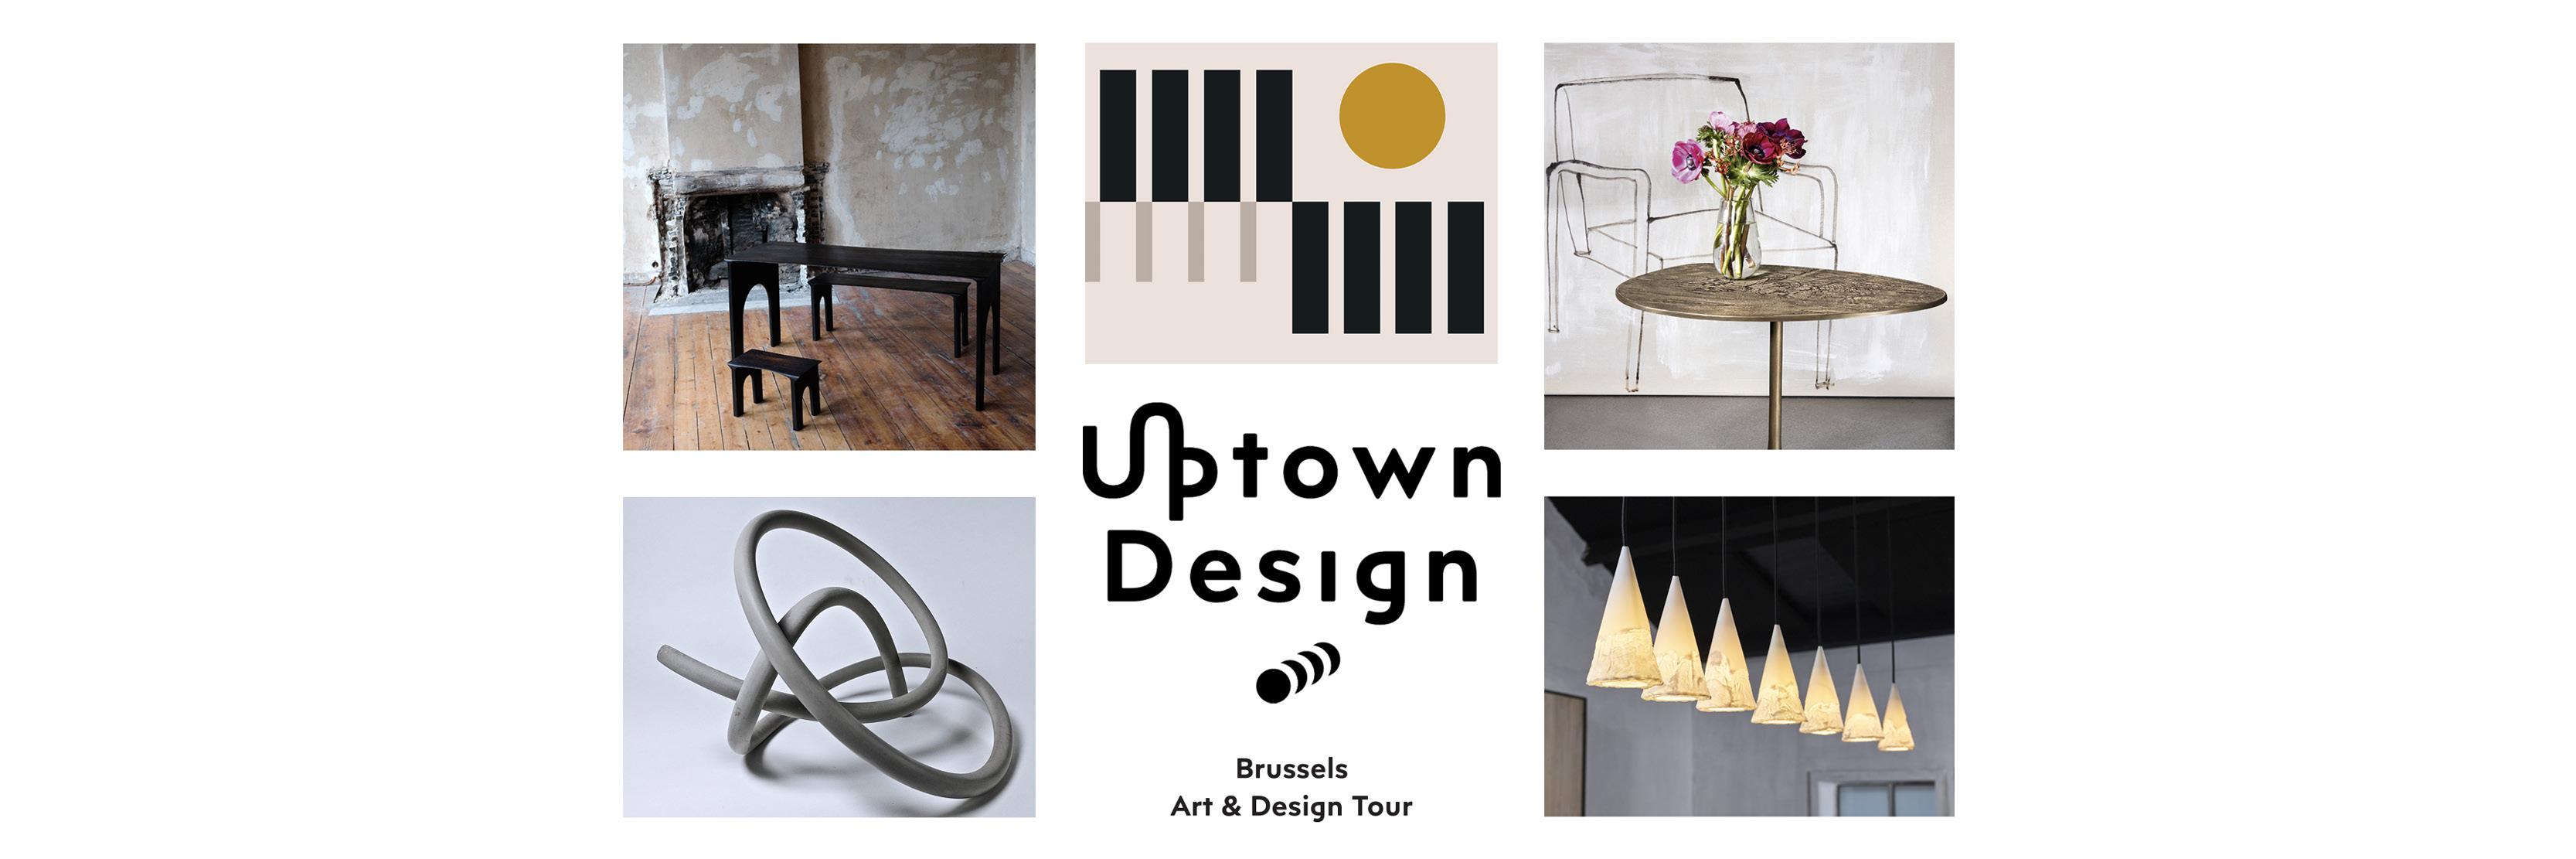 Uptown Design 2019 - Brussels Art & Design Tour